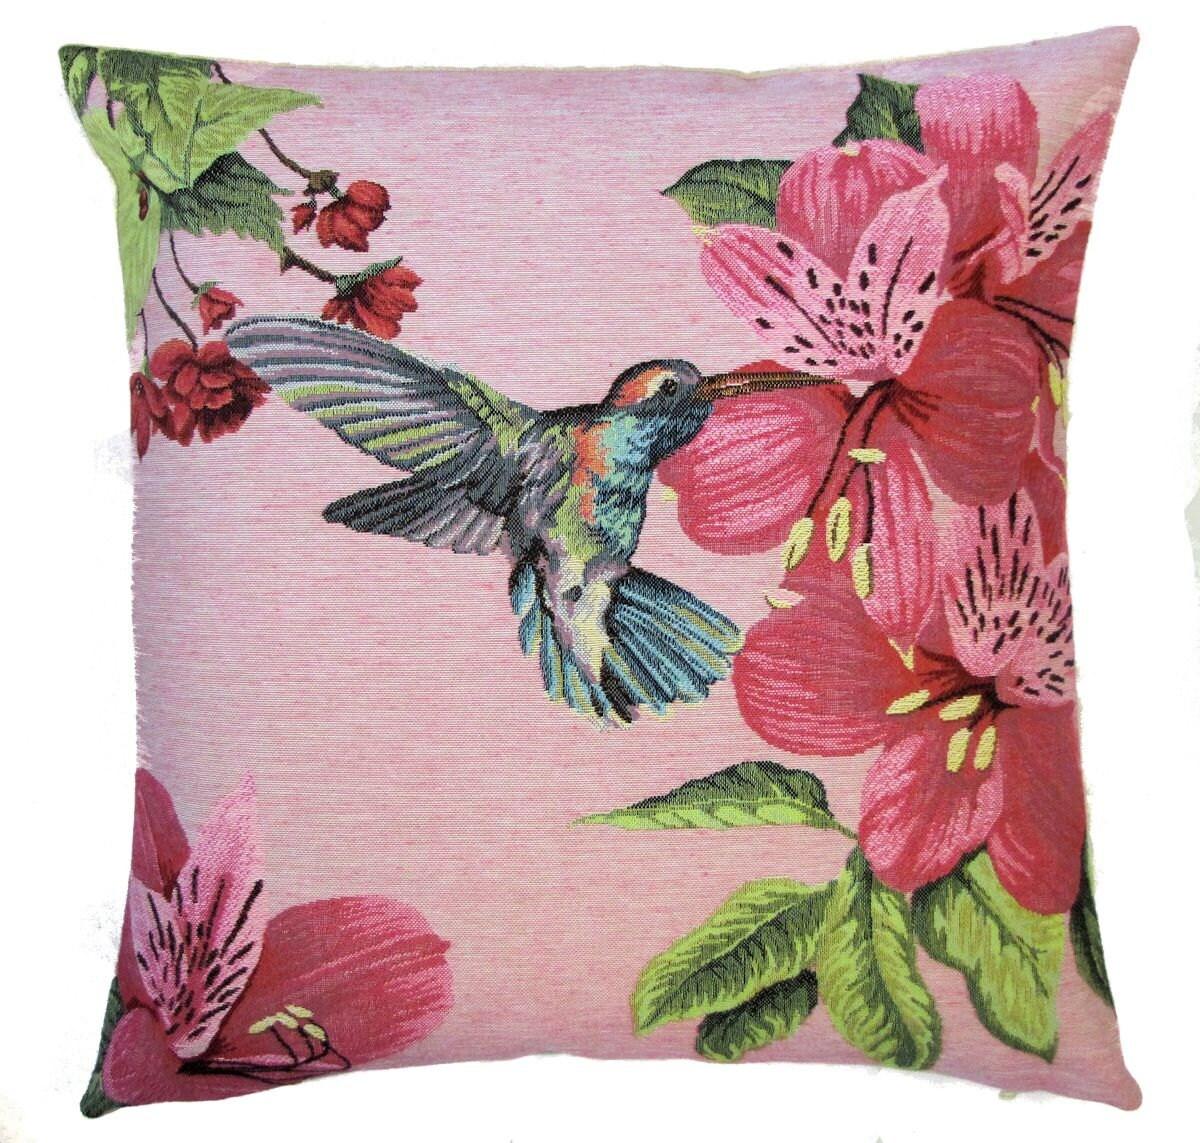 Hummingbird Pillow Cover Hummingbird Gift Pink Pillow 18x18